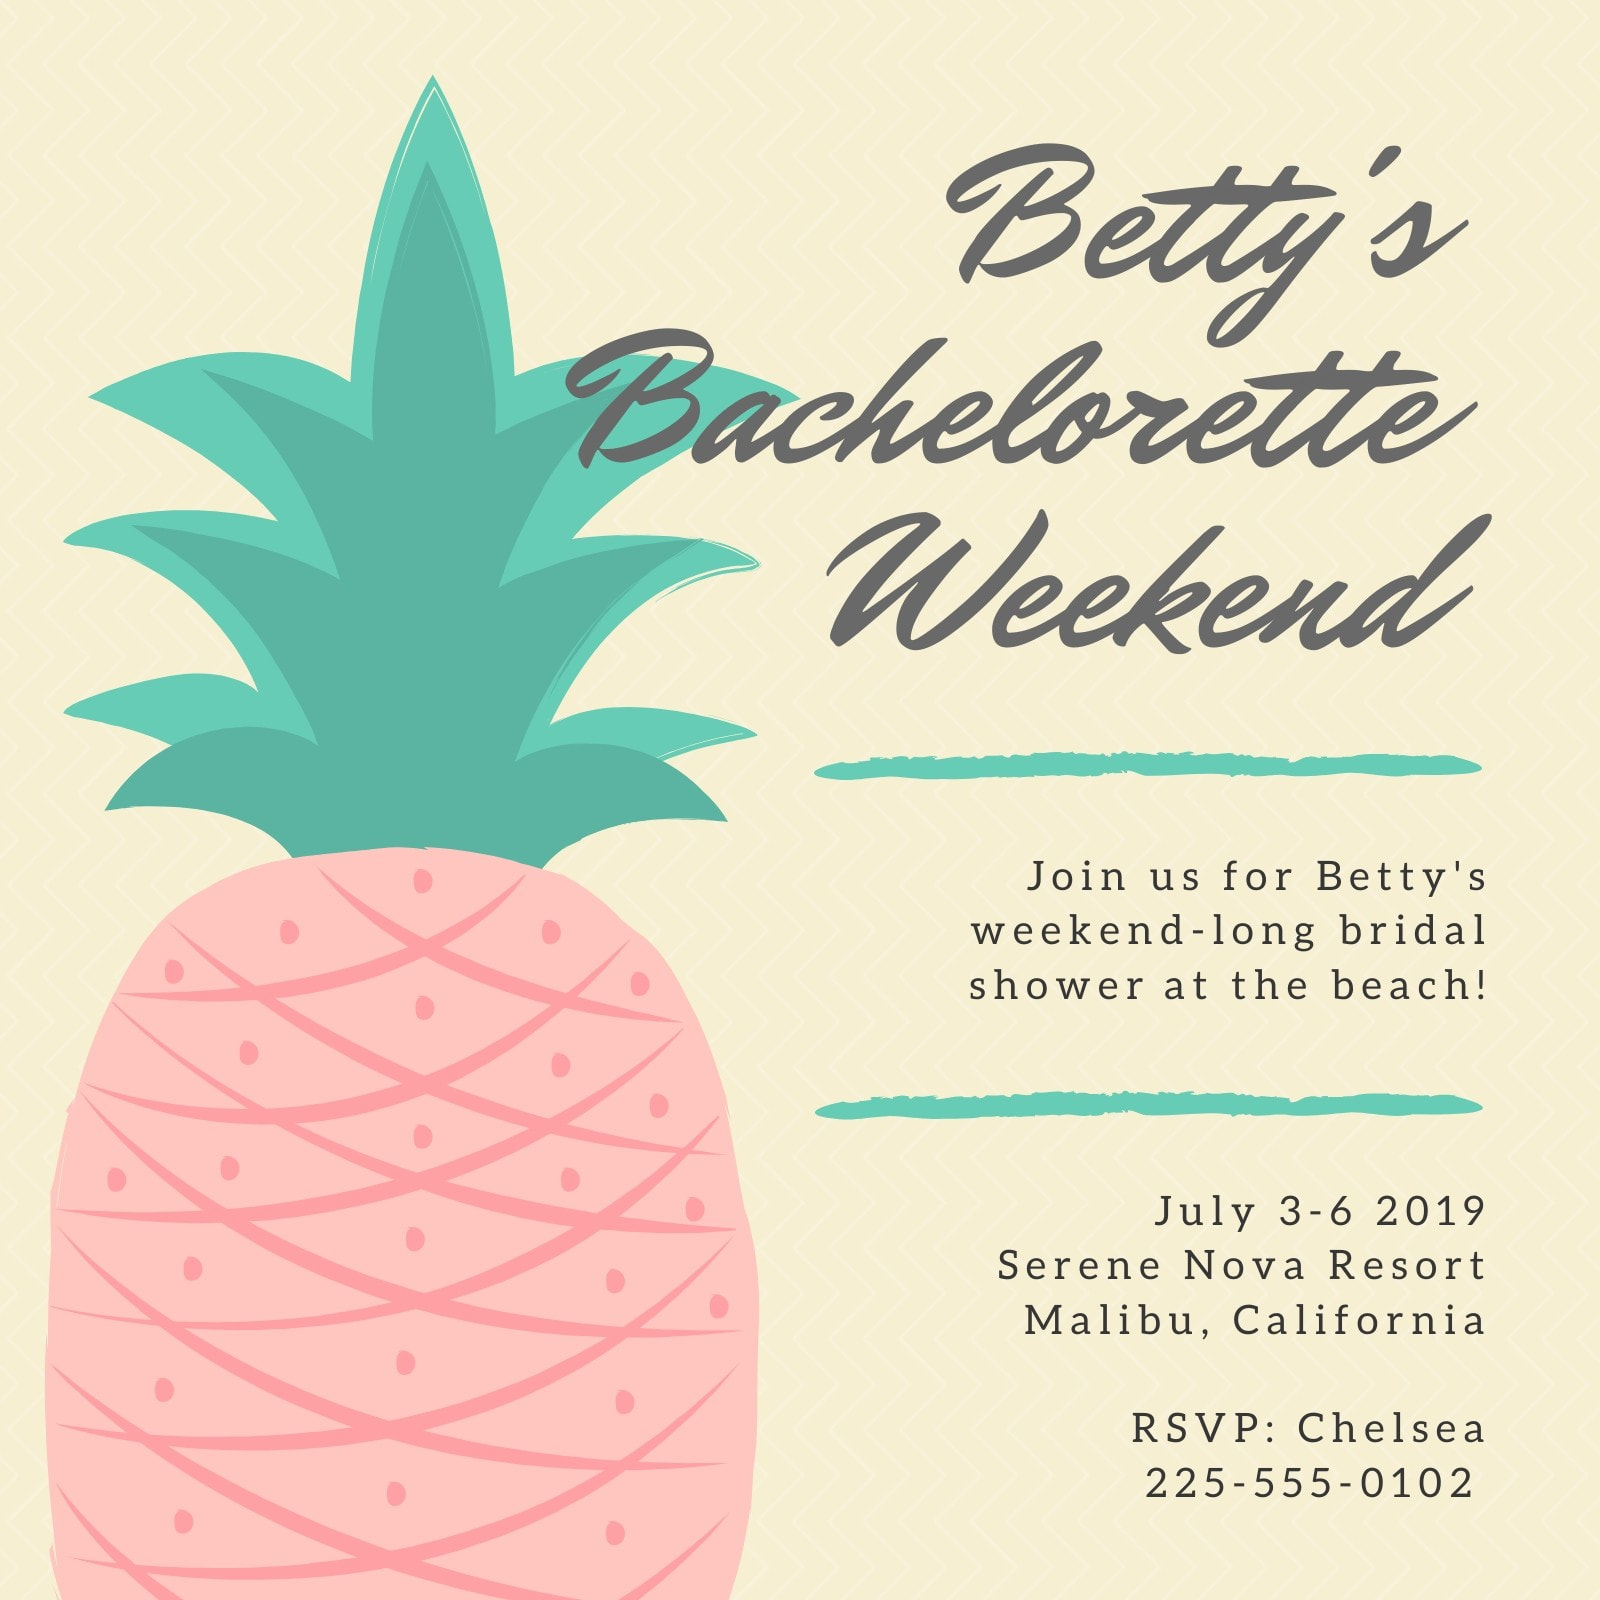 Pineapple Themed Bridal Shower Invitation